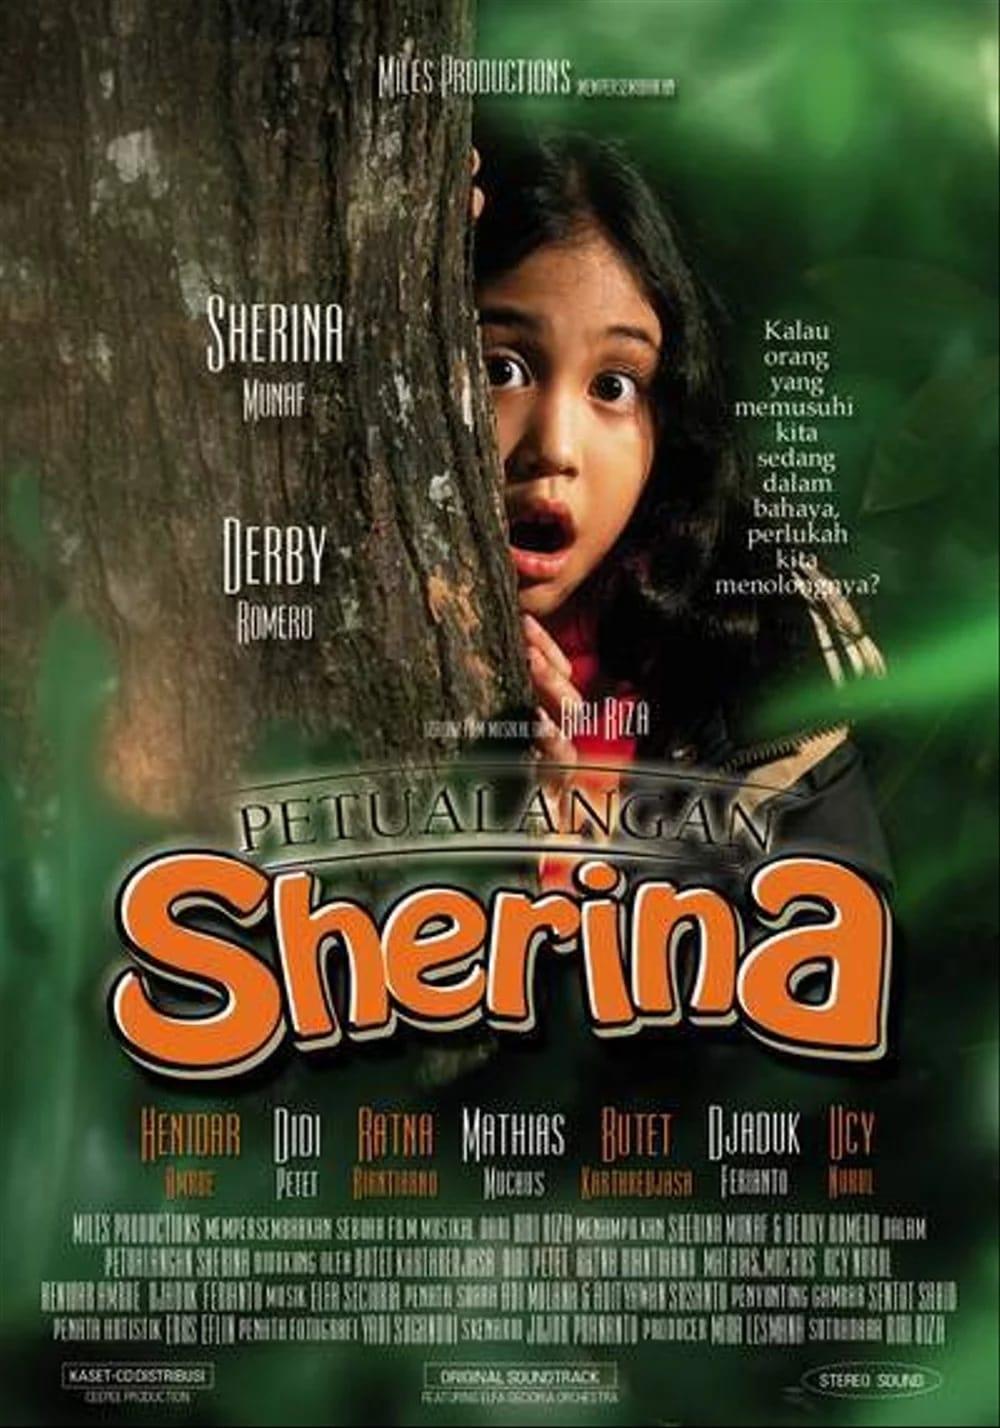 Petualangan Sherina (2000) - Posters — The Movie Database (TMDb)